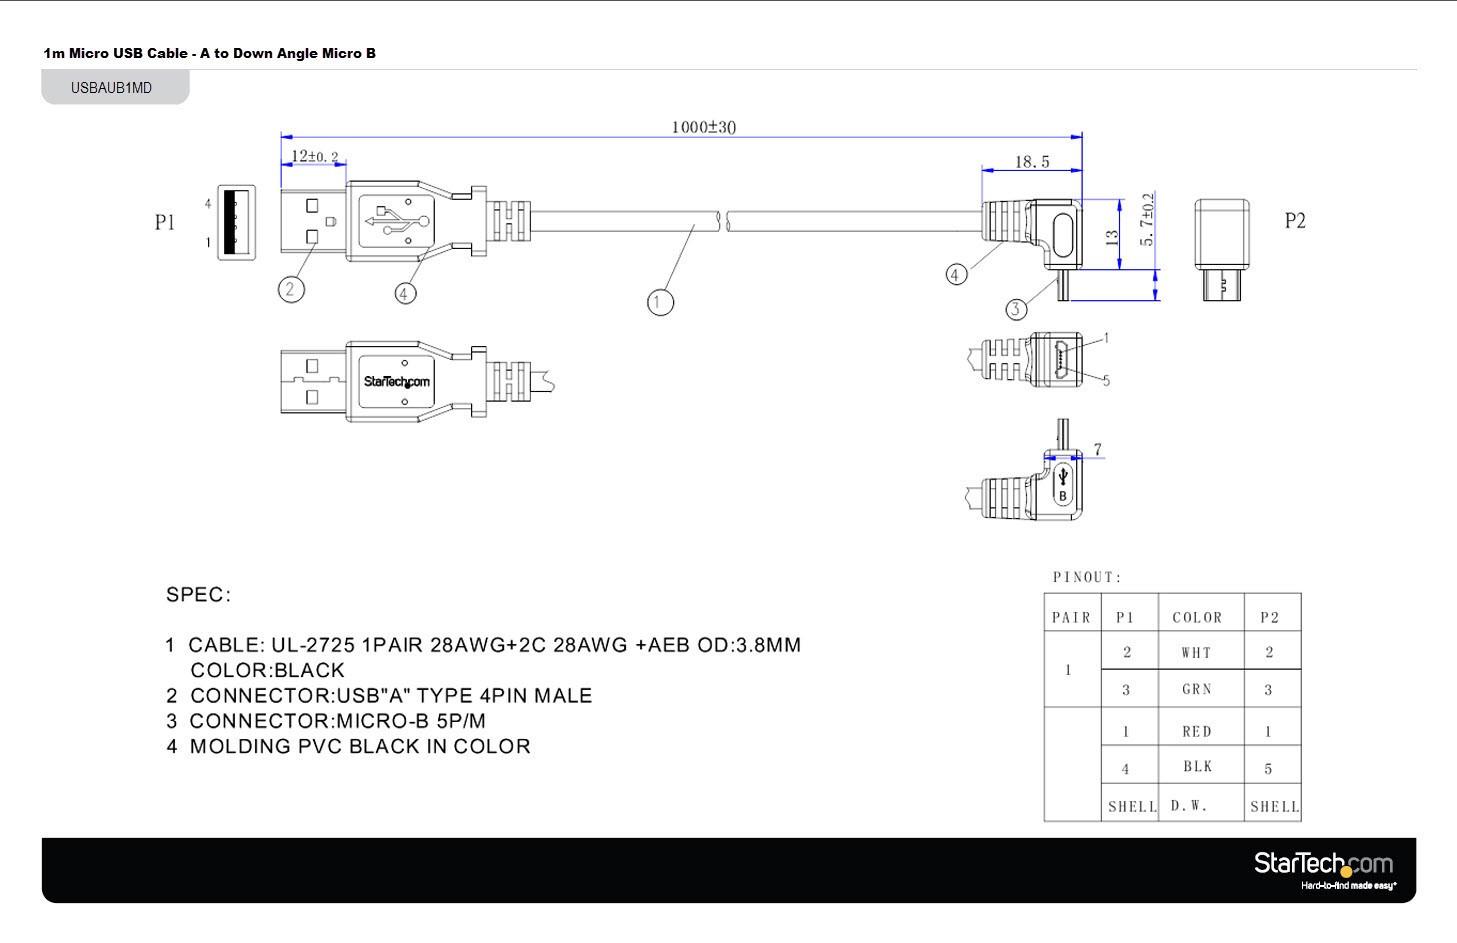 Sensational Hdmi Cable Pin Diagram Electrical Wiring Diagram Software Wiring Cloud Hemtegremohammedshrineorg